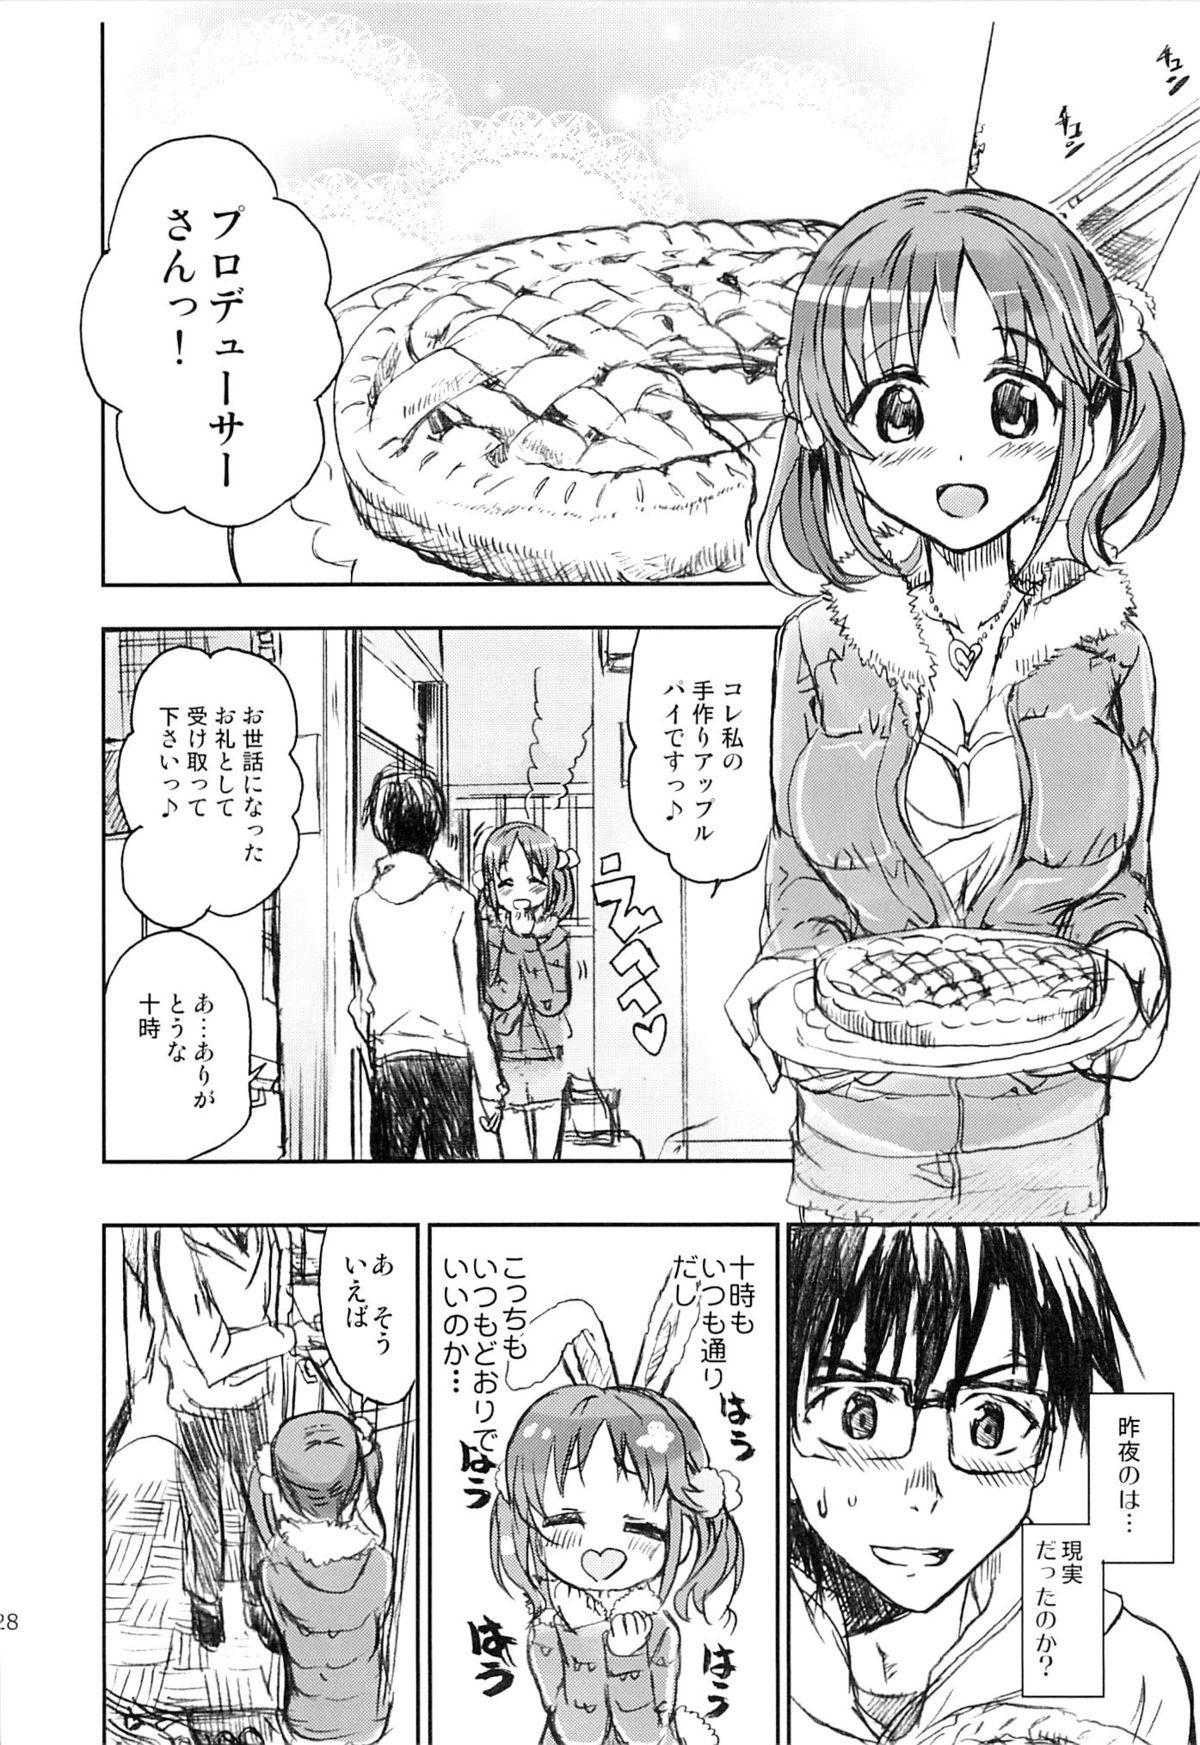 Passion Fruit Girls #Totoki Airi Princess Bunny wa Nemuranai 26